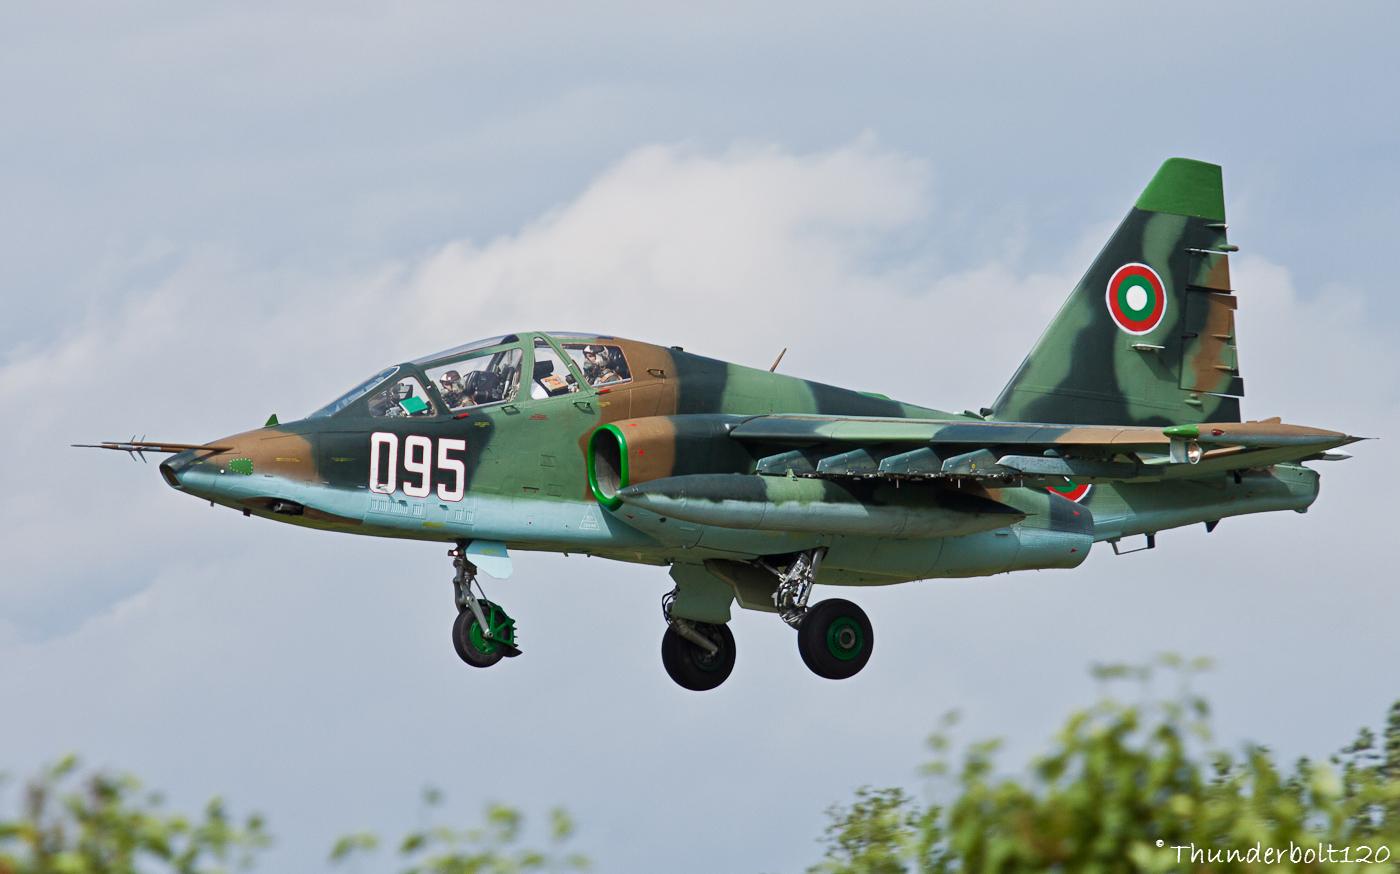 Su-25 UBK Frogfoot 095k